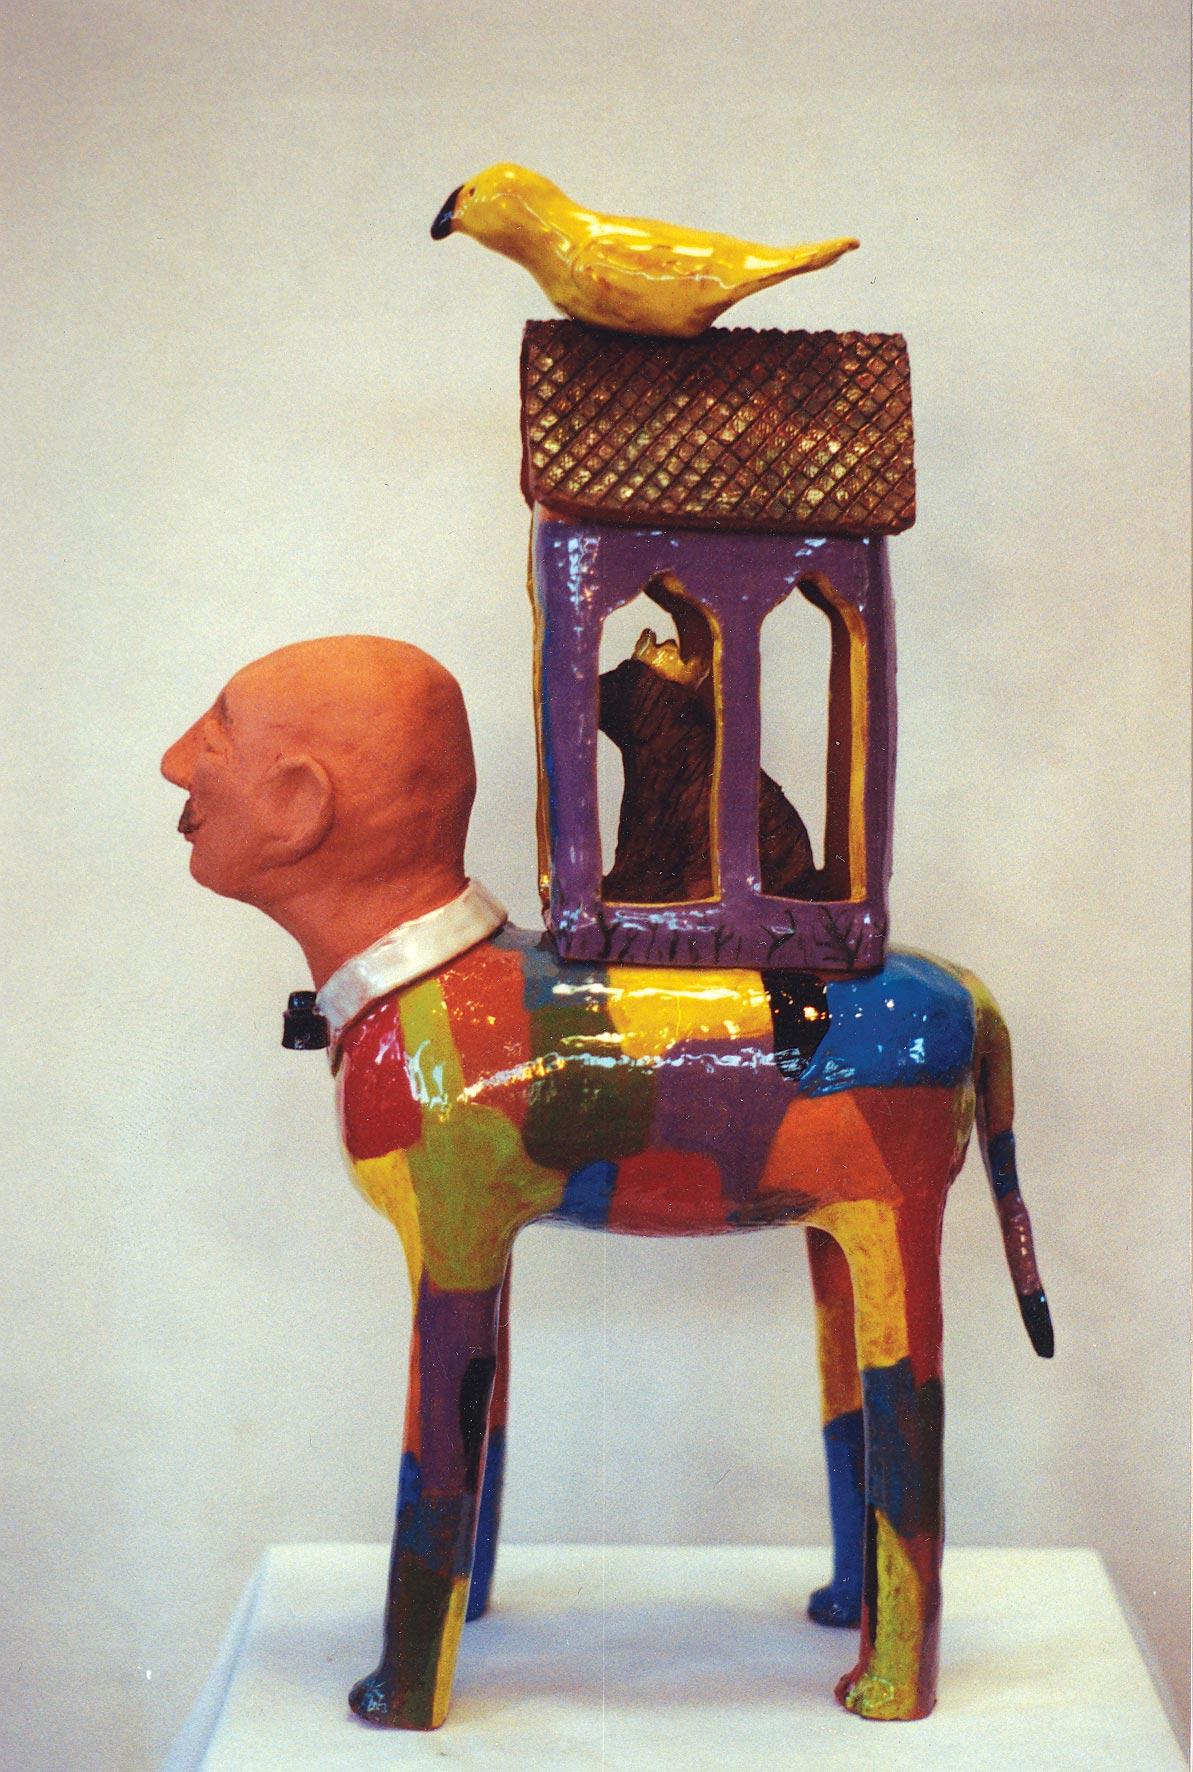 His-Dog-Is-King.jpg